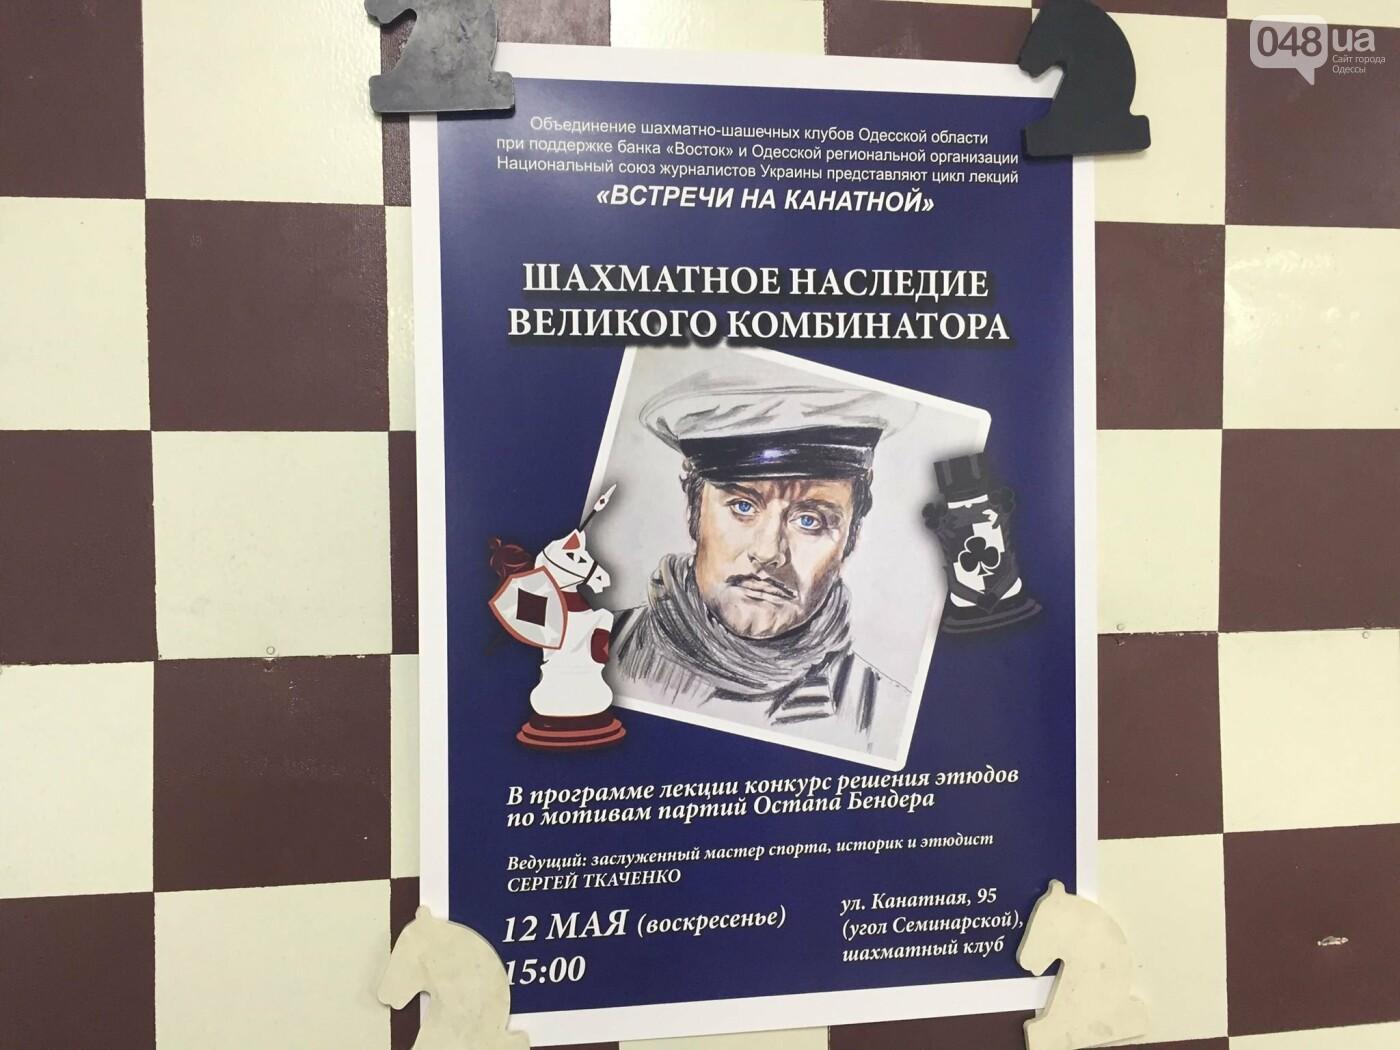 Одесситам рассказали о шахматном наследии Остапа Бендера,  - ФОТО, ВИДЕО, фото-1, Фото: 048